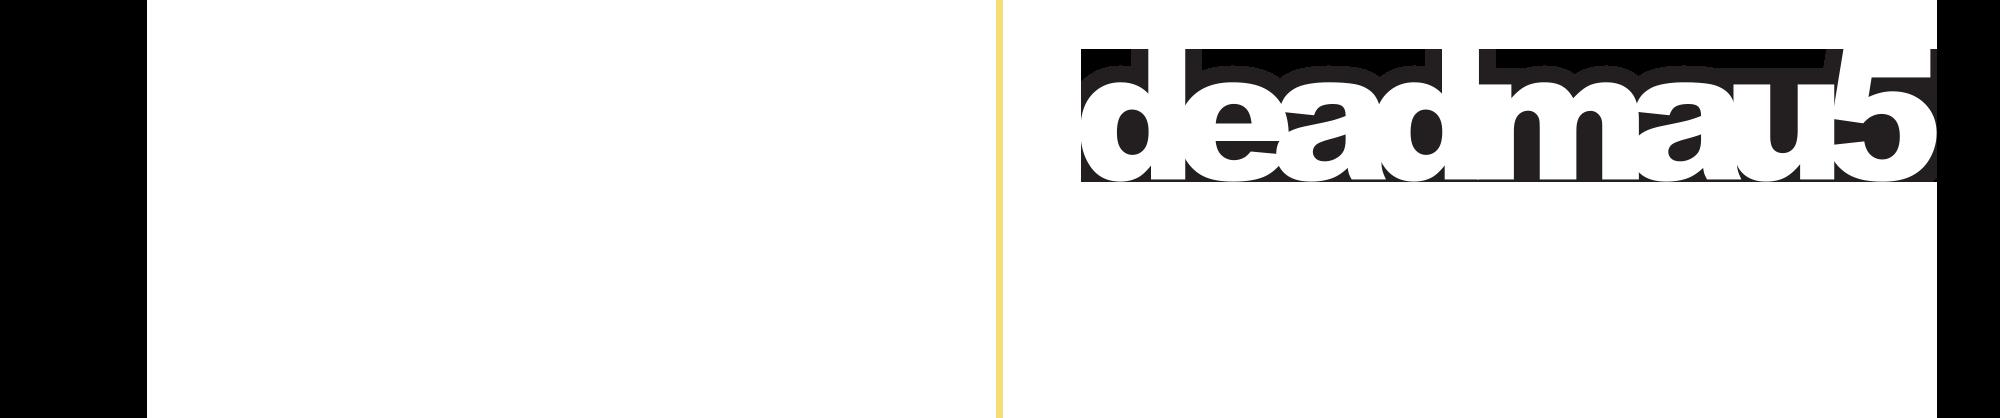 Das Energi Festival Lineup Feat Kaskade, Dillon Francis, Deadmau5, Rezz and more!